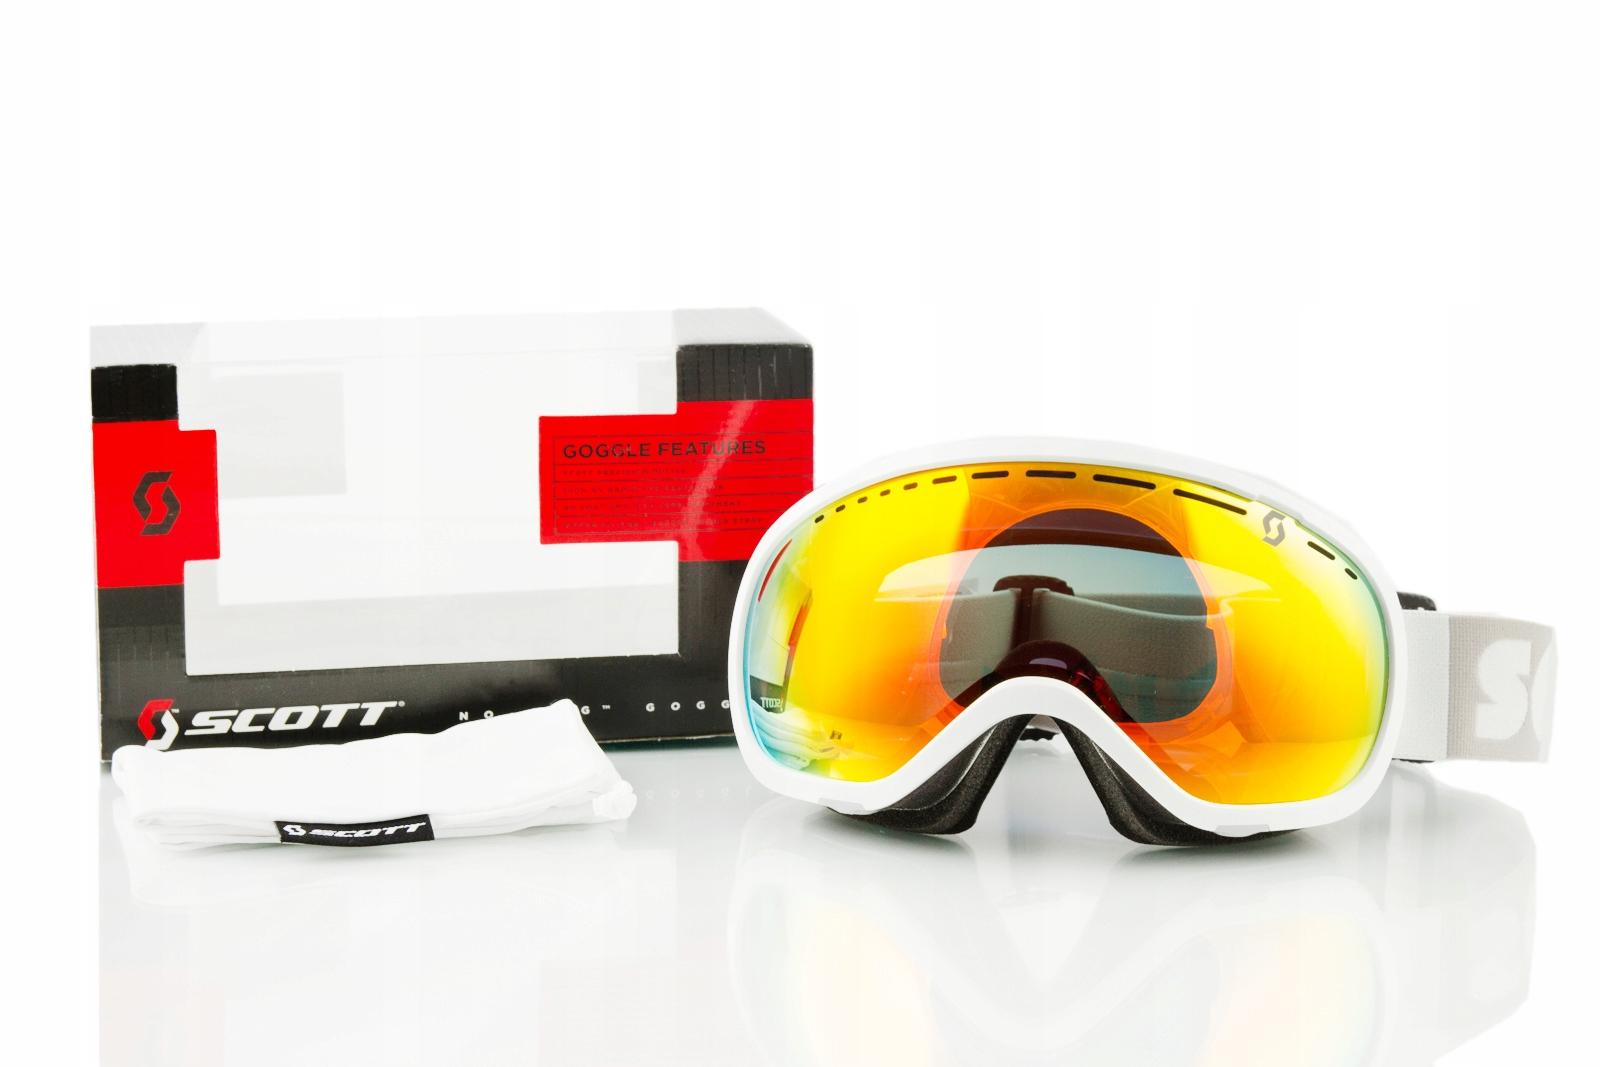 Gogle SCOTT OFF-GRID ACS narty snowboard